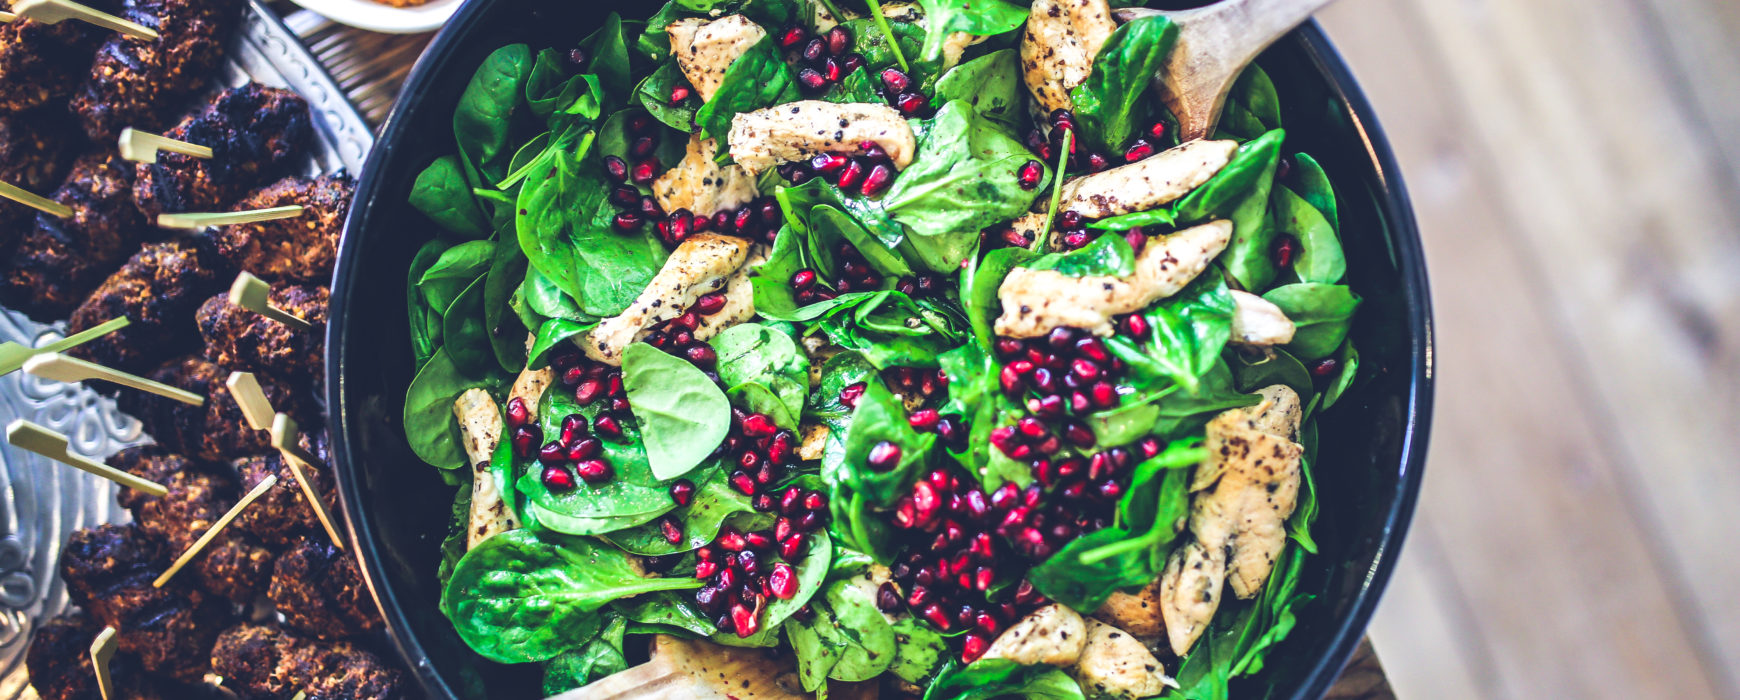 Spinach Salad, Pomegranate Seeds, Grilled Chicken